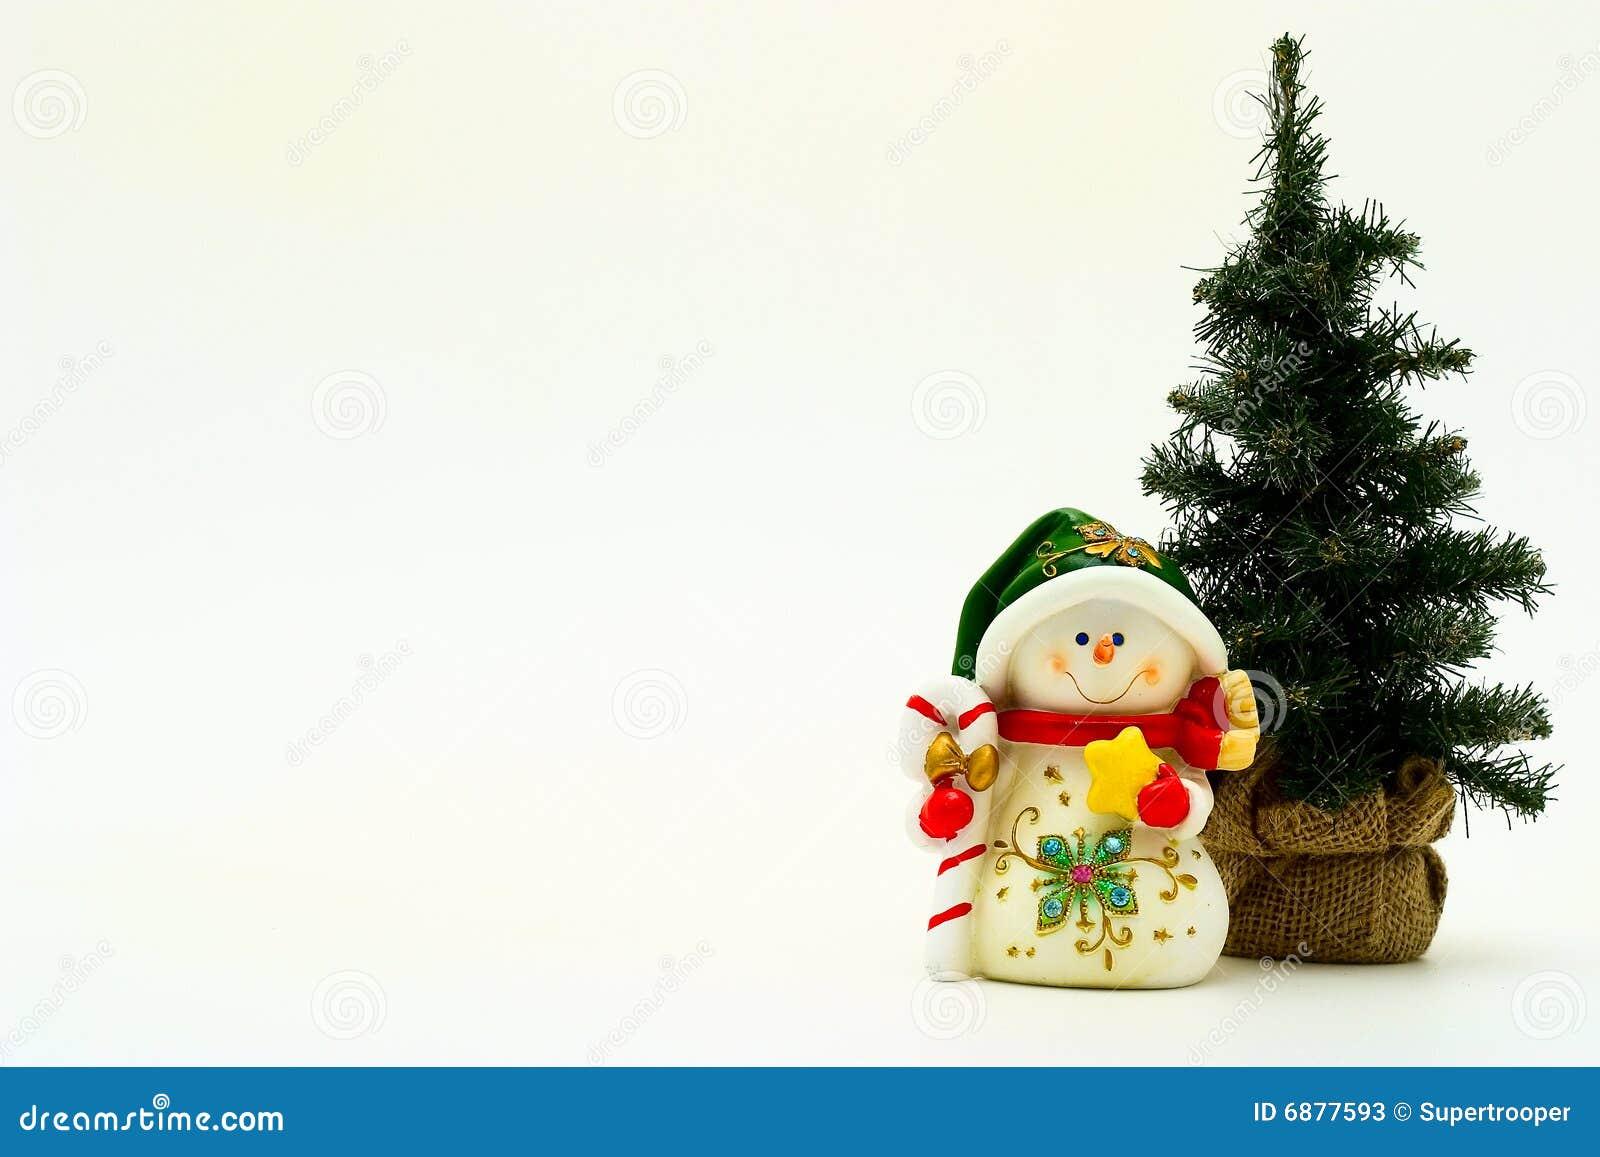 Christmas Tree Miracle